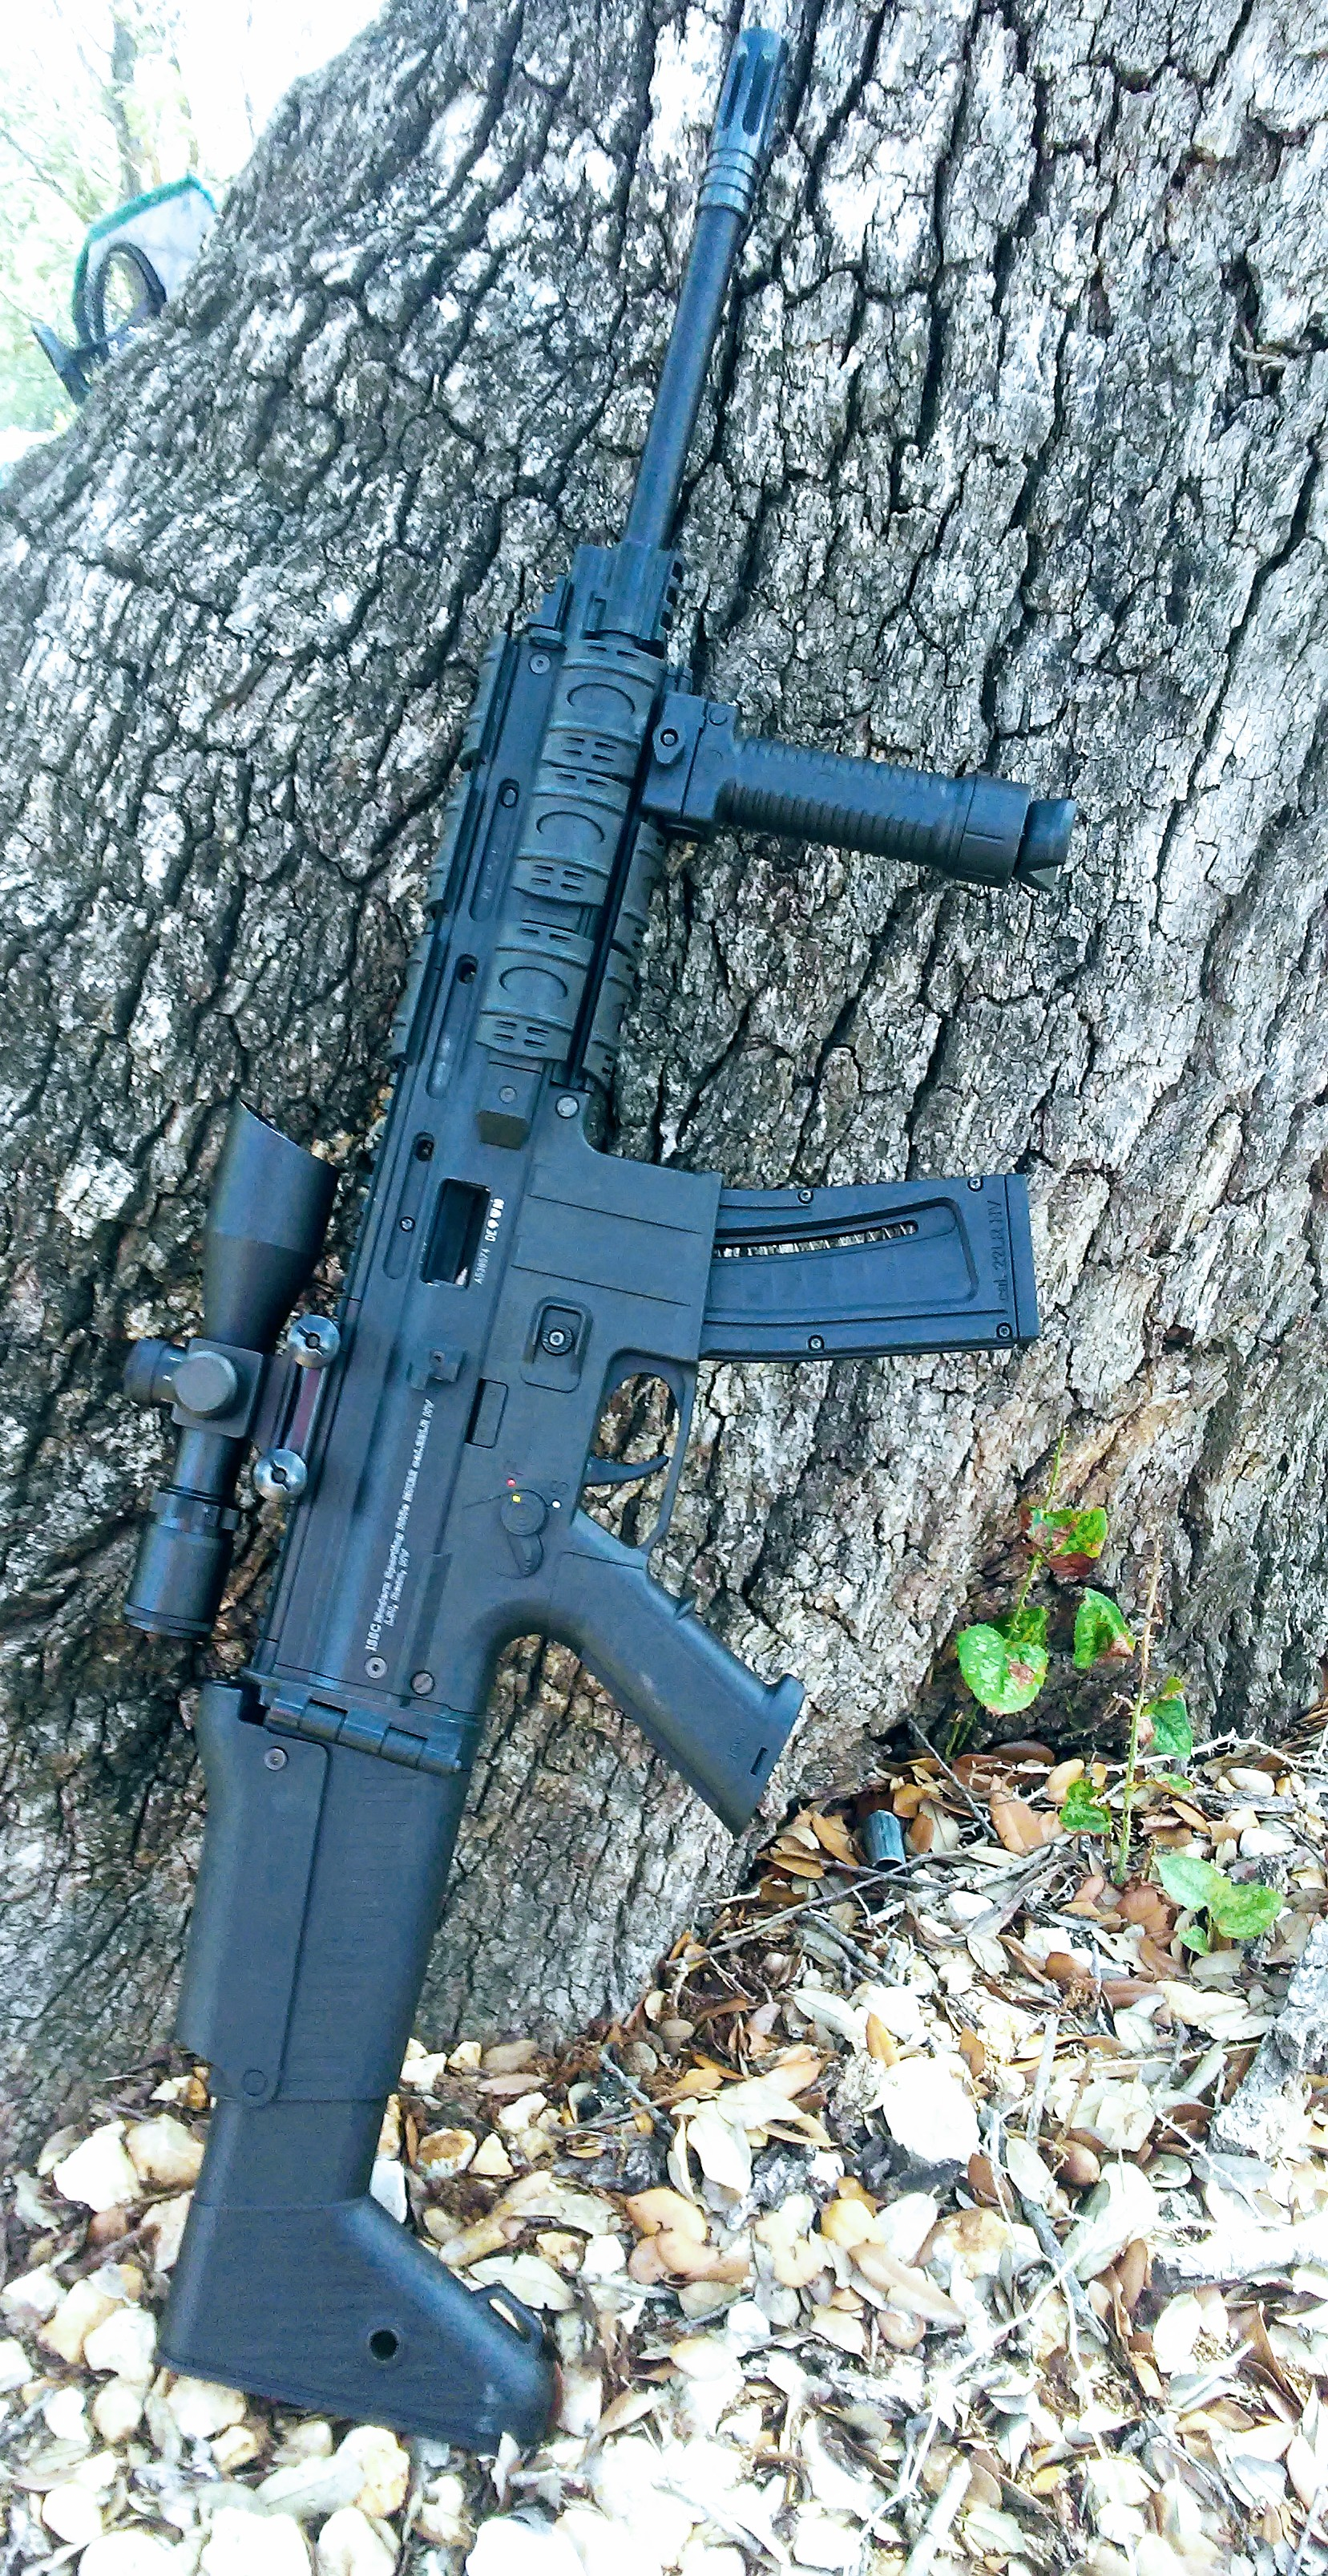 Semi-Automatic Rifle